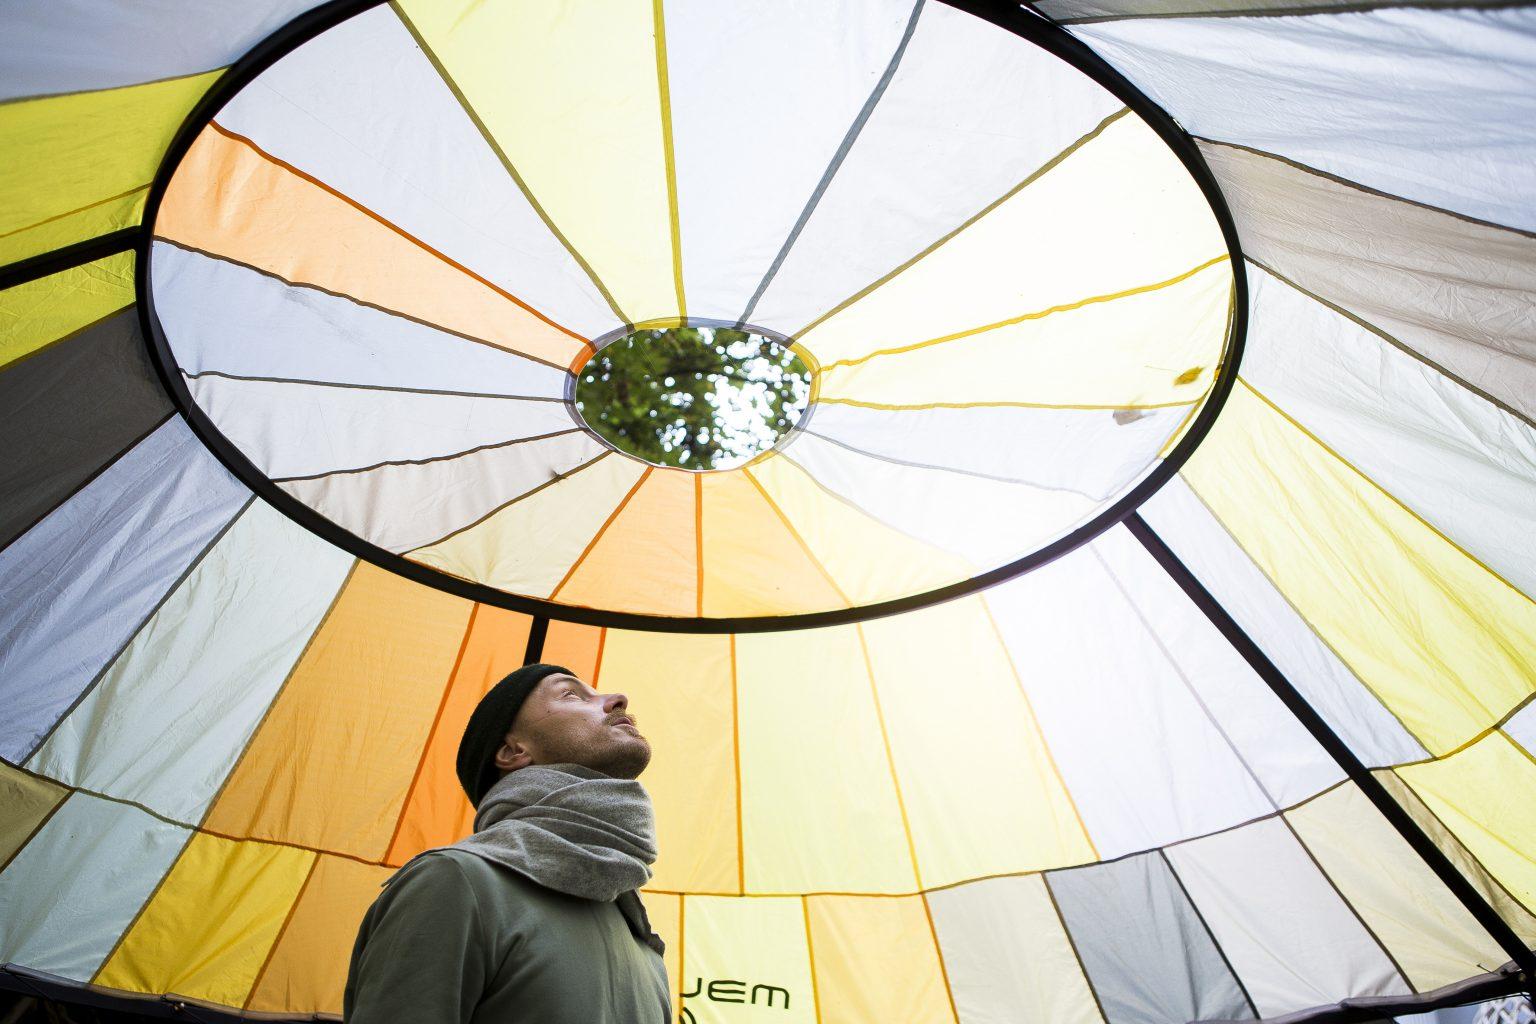 Biennale Interieur - Belgium's leading design and interior event - Doty 2020 sep verboom - copy sam gilbert (4)